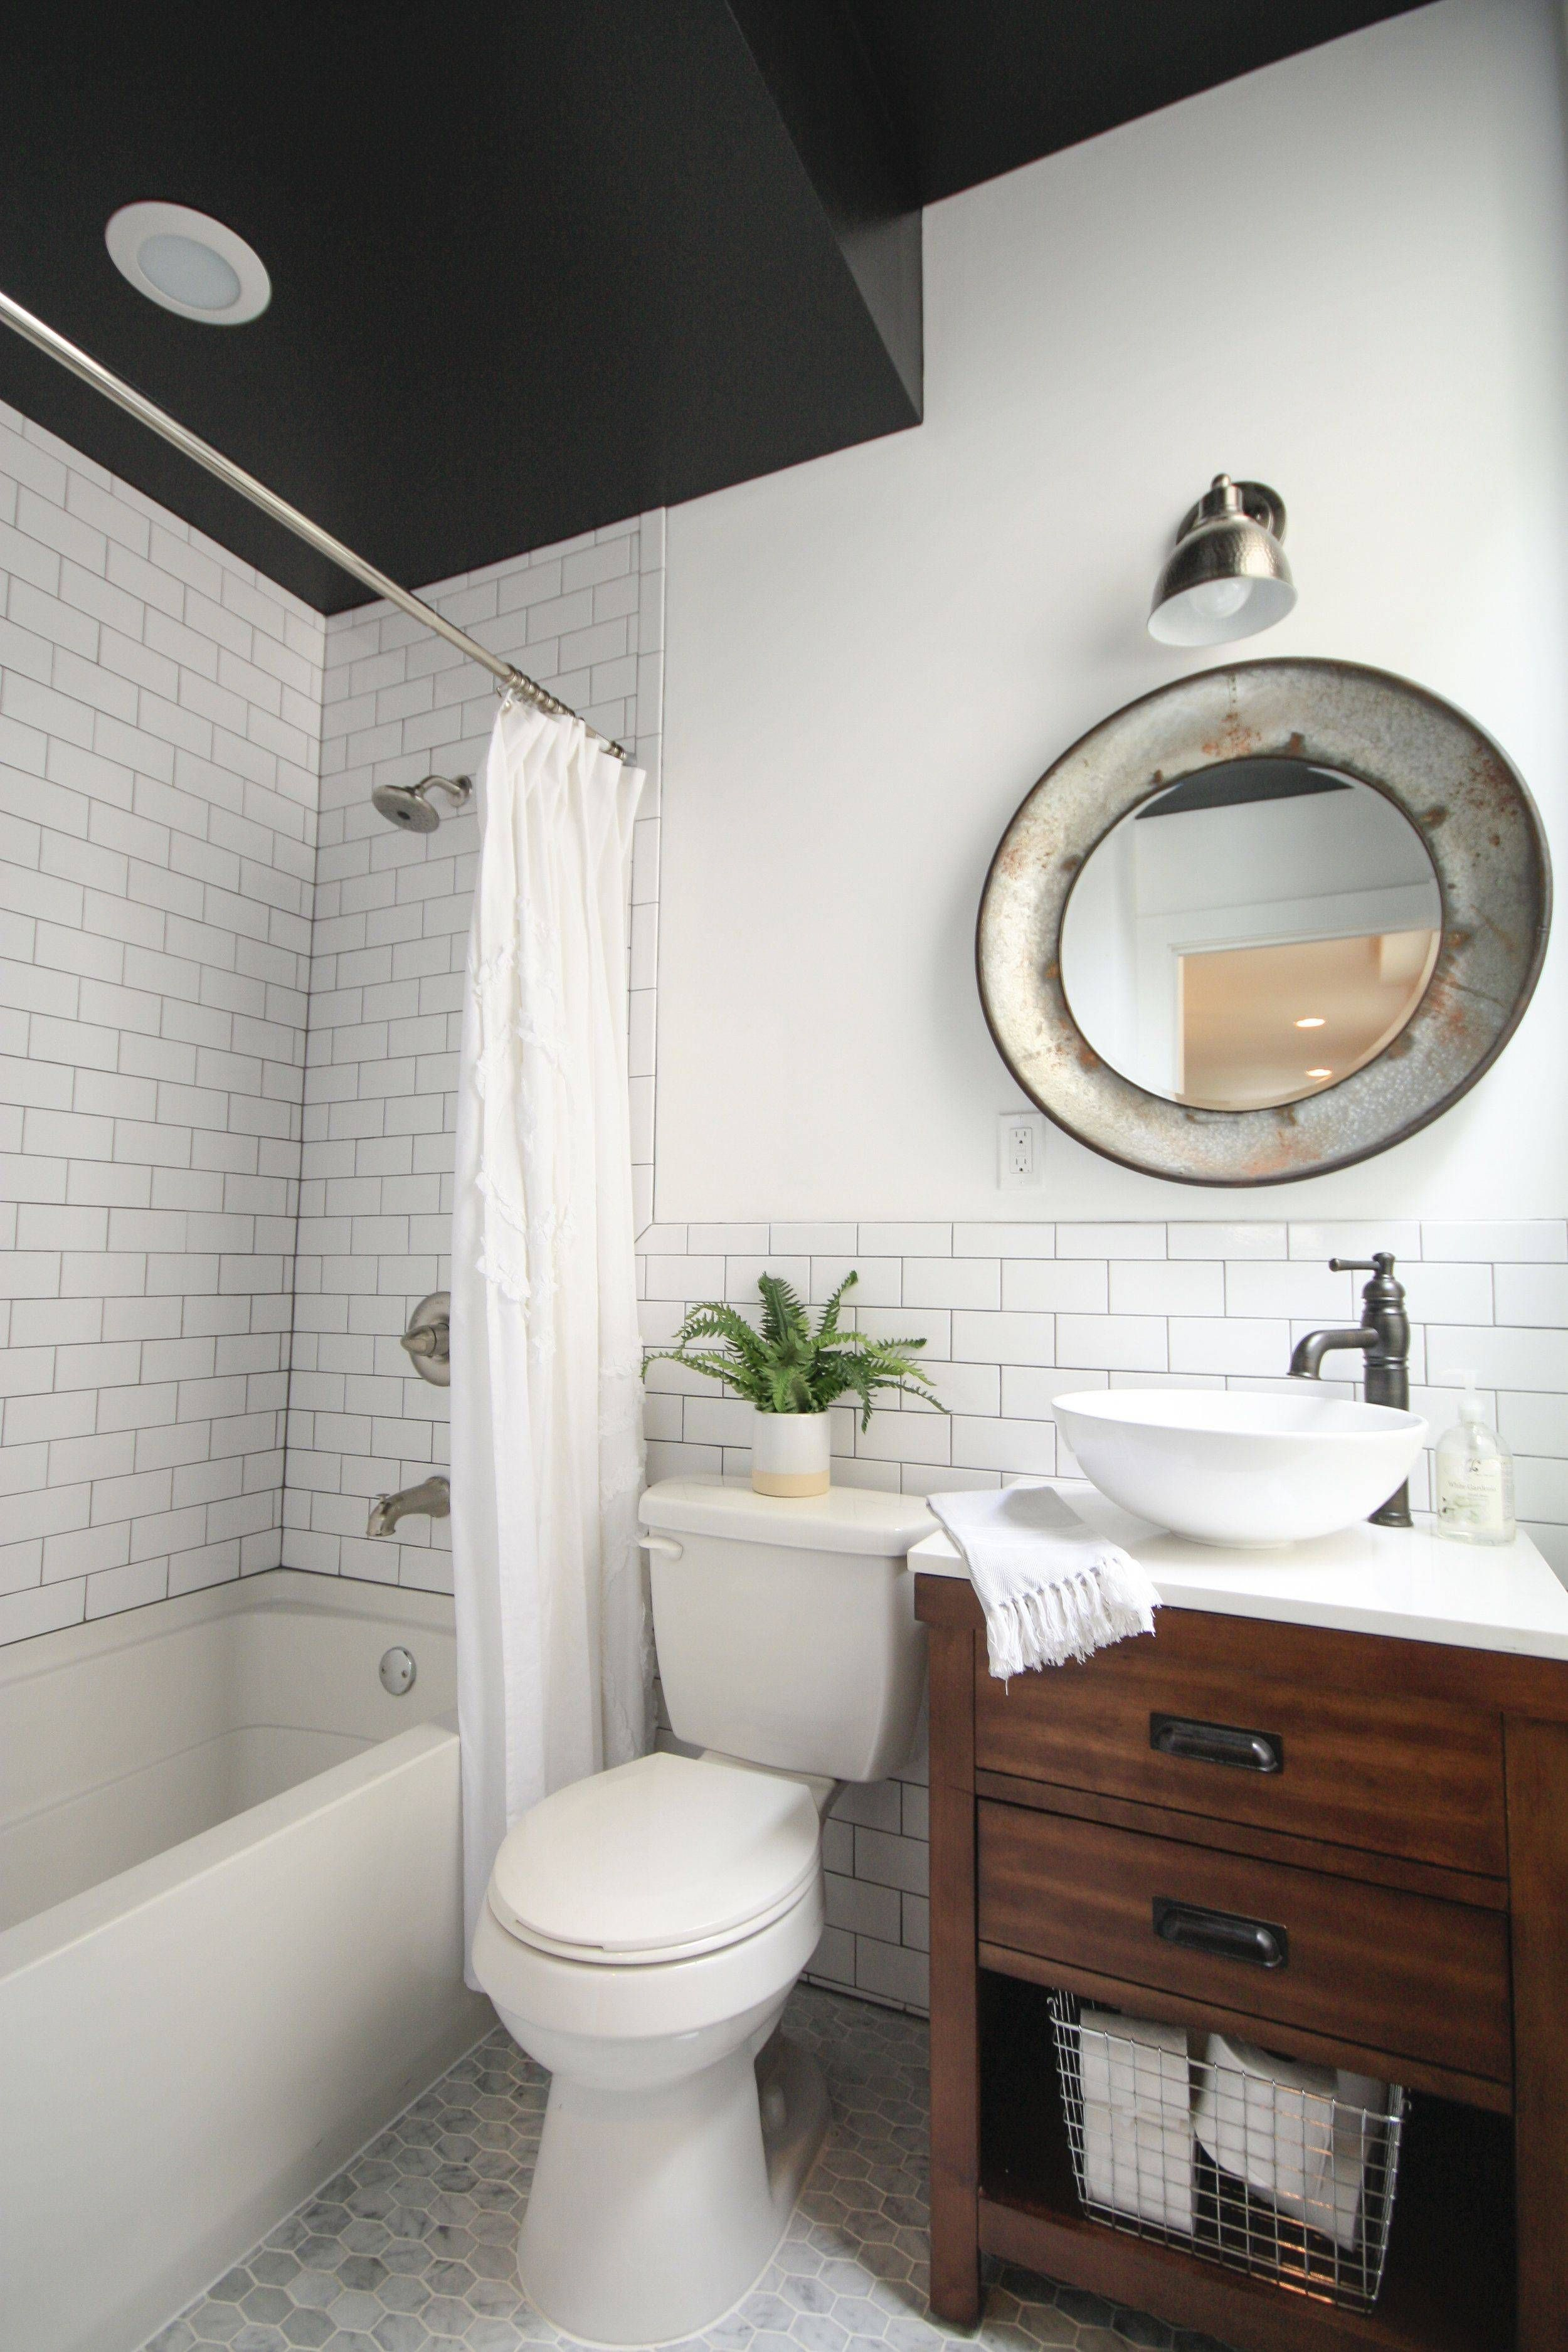 Black And White Tile Bathroom Decorating Ideas In 2020 Mold On Bathroom Ceiling Black And White Tiles Bathroom White Subway Tile Shower